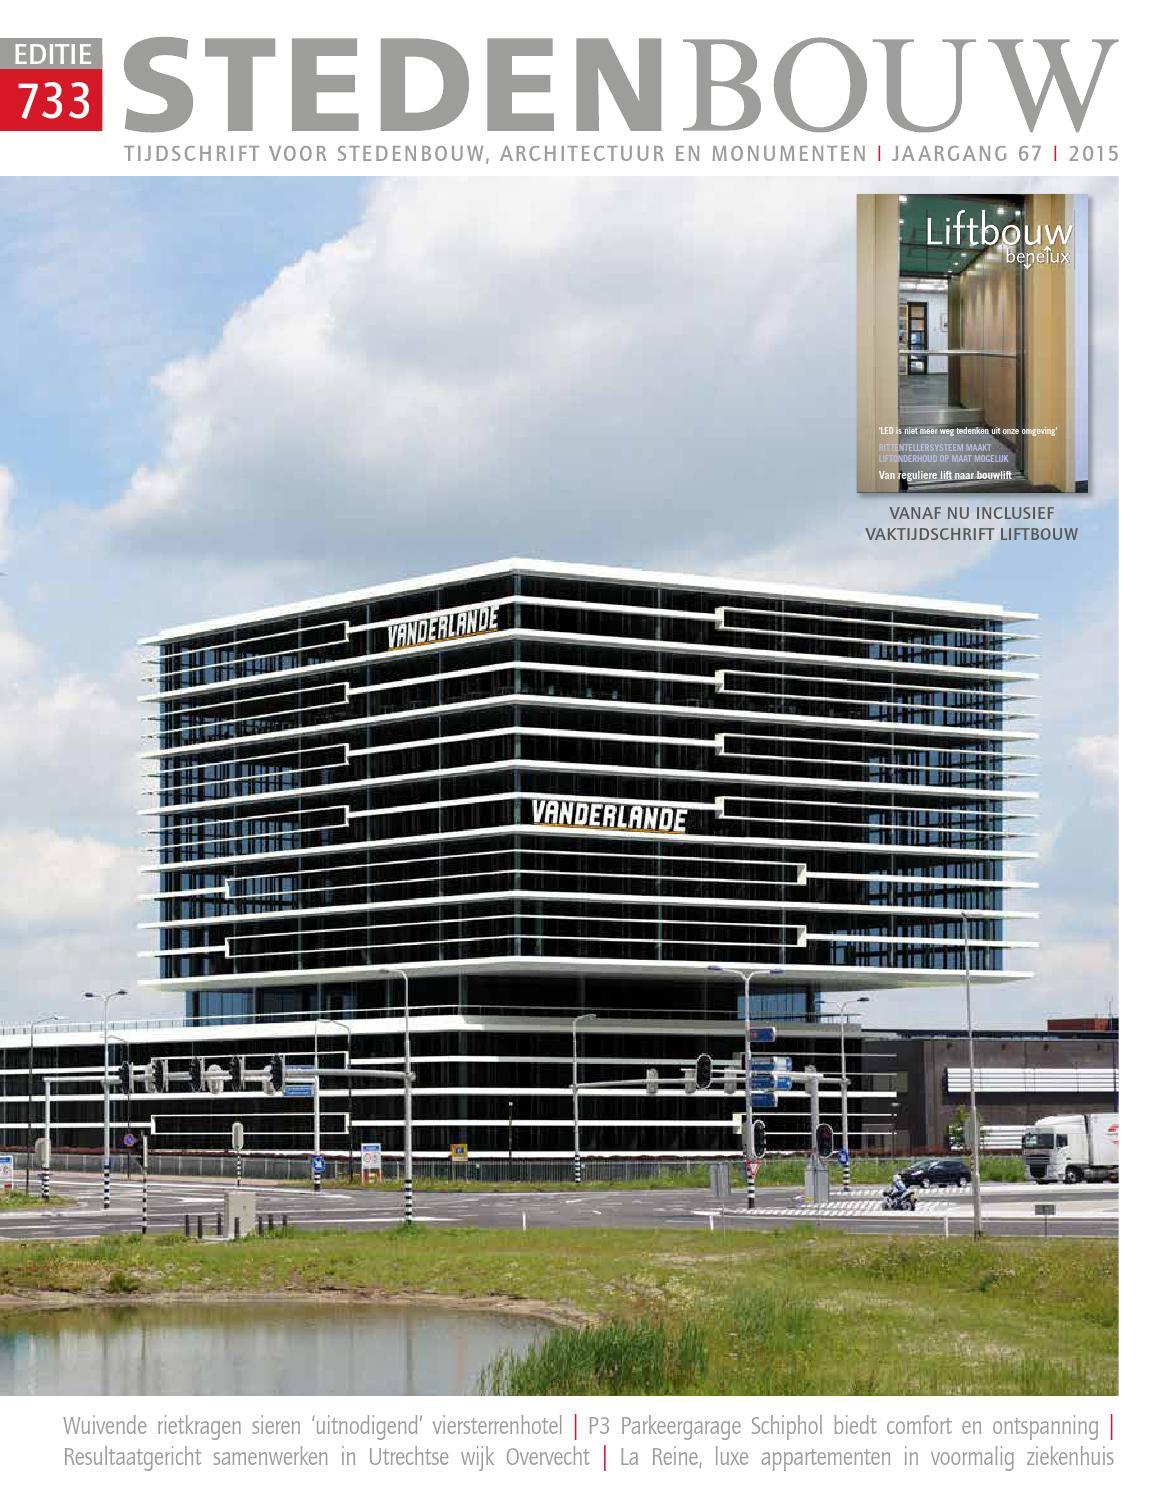 f374ee6b167 Stedenbouw 733 by Louwers Uitgeversorganisatie BV - issuu